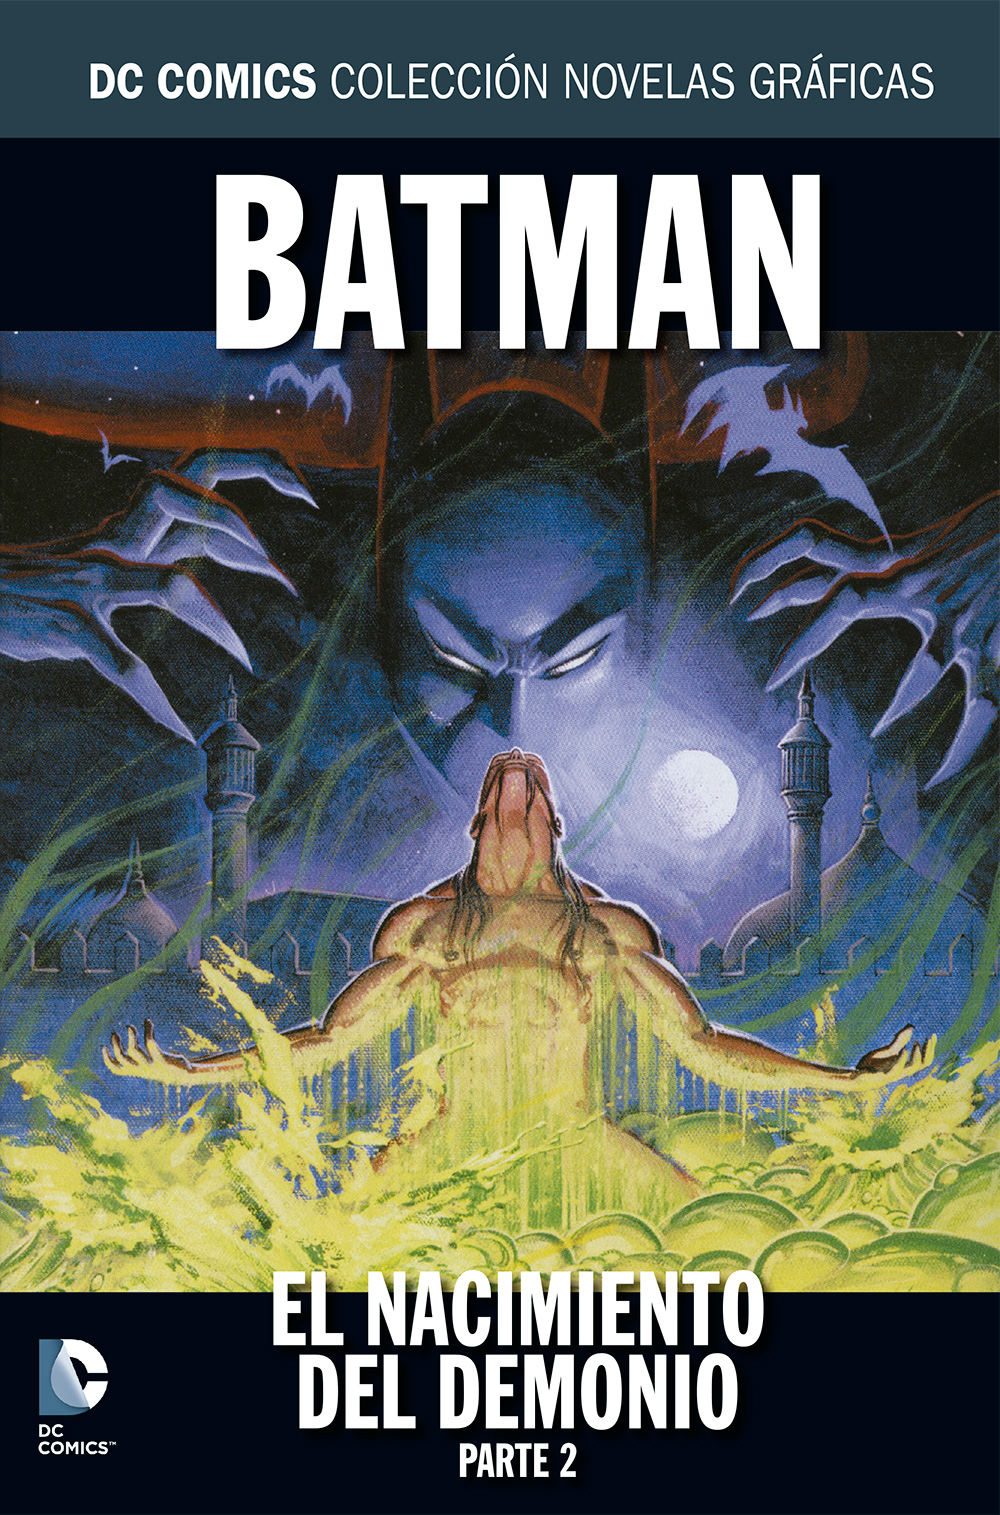 41-44 - [DC - Salvat] La Colección de Novelas Gráficas de DC Comics  SF118_028_01_001